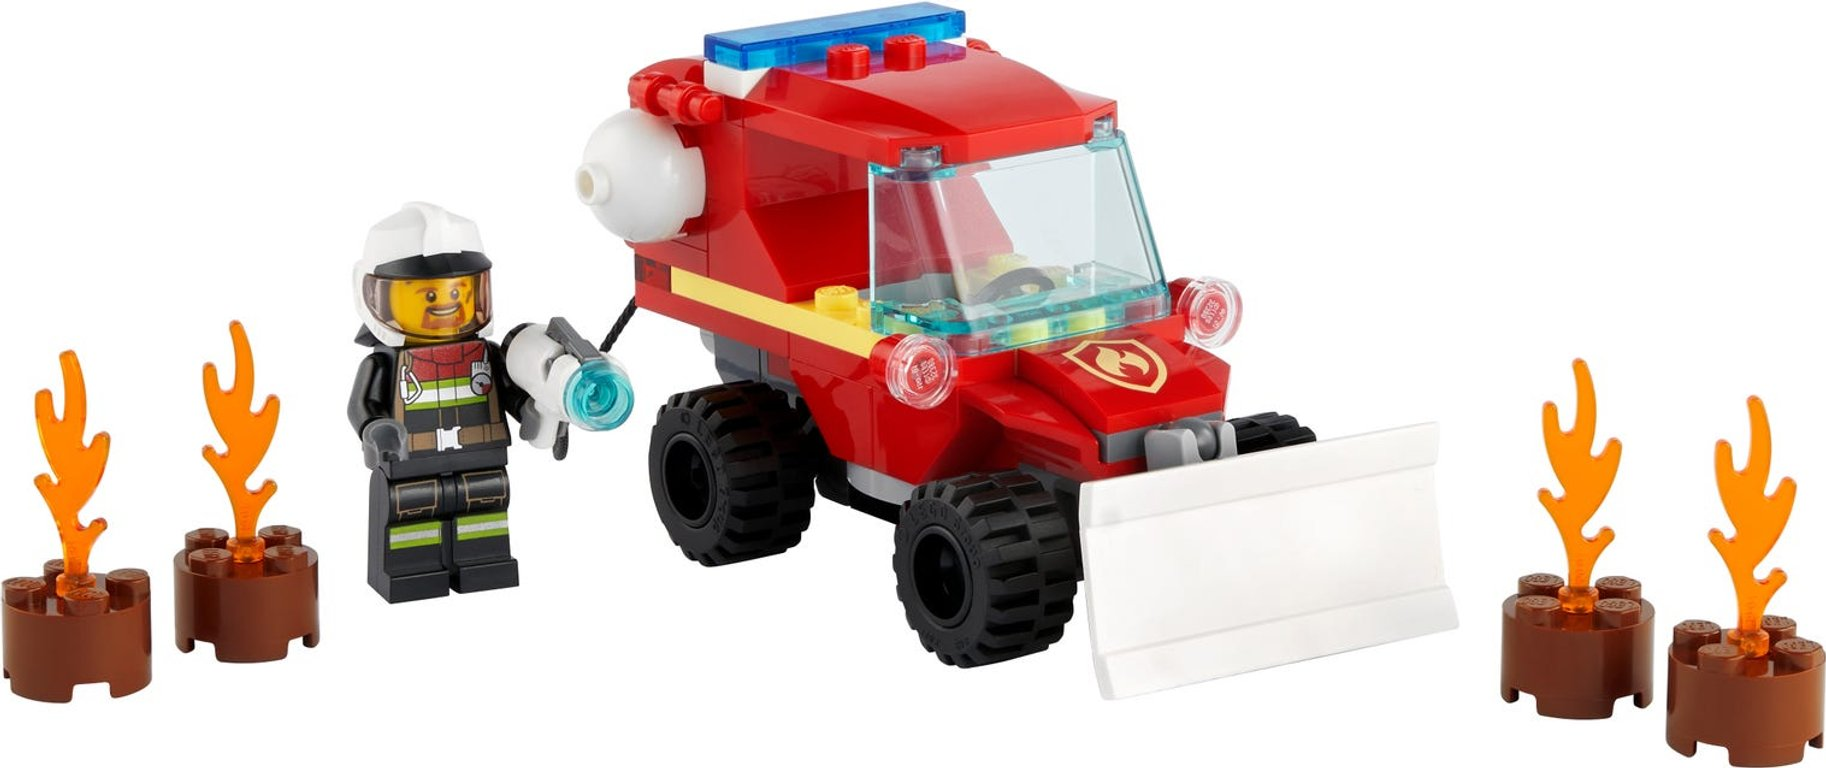 LEGO® City Fire Hazard Truck components